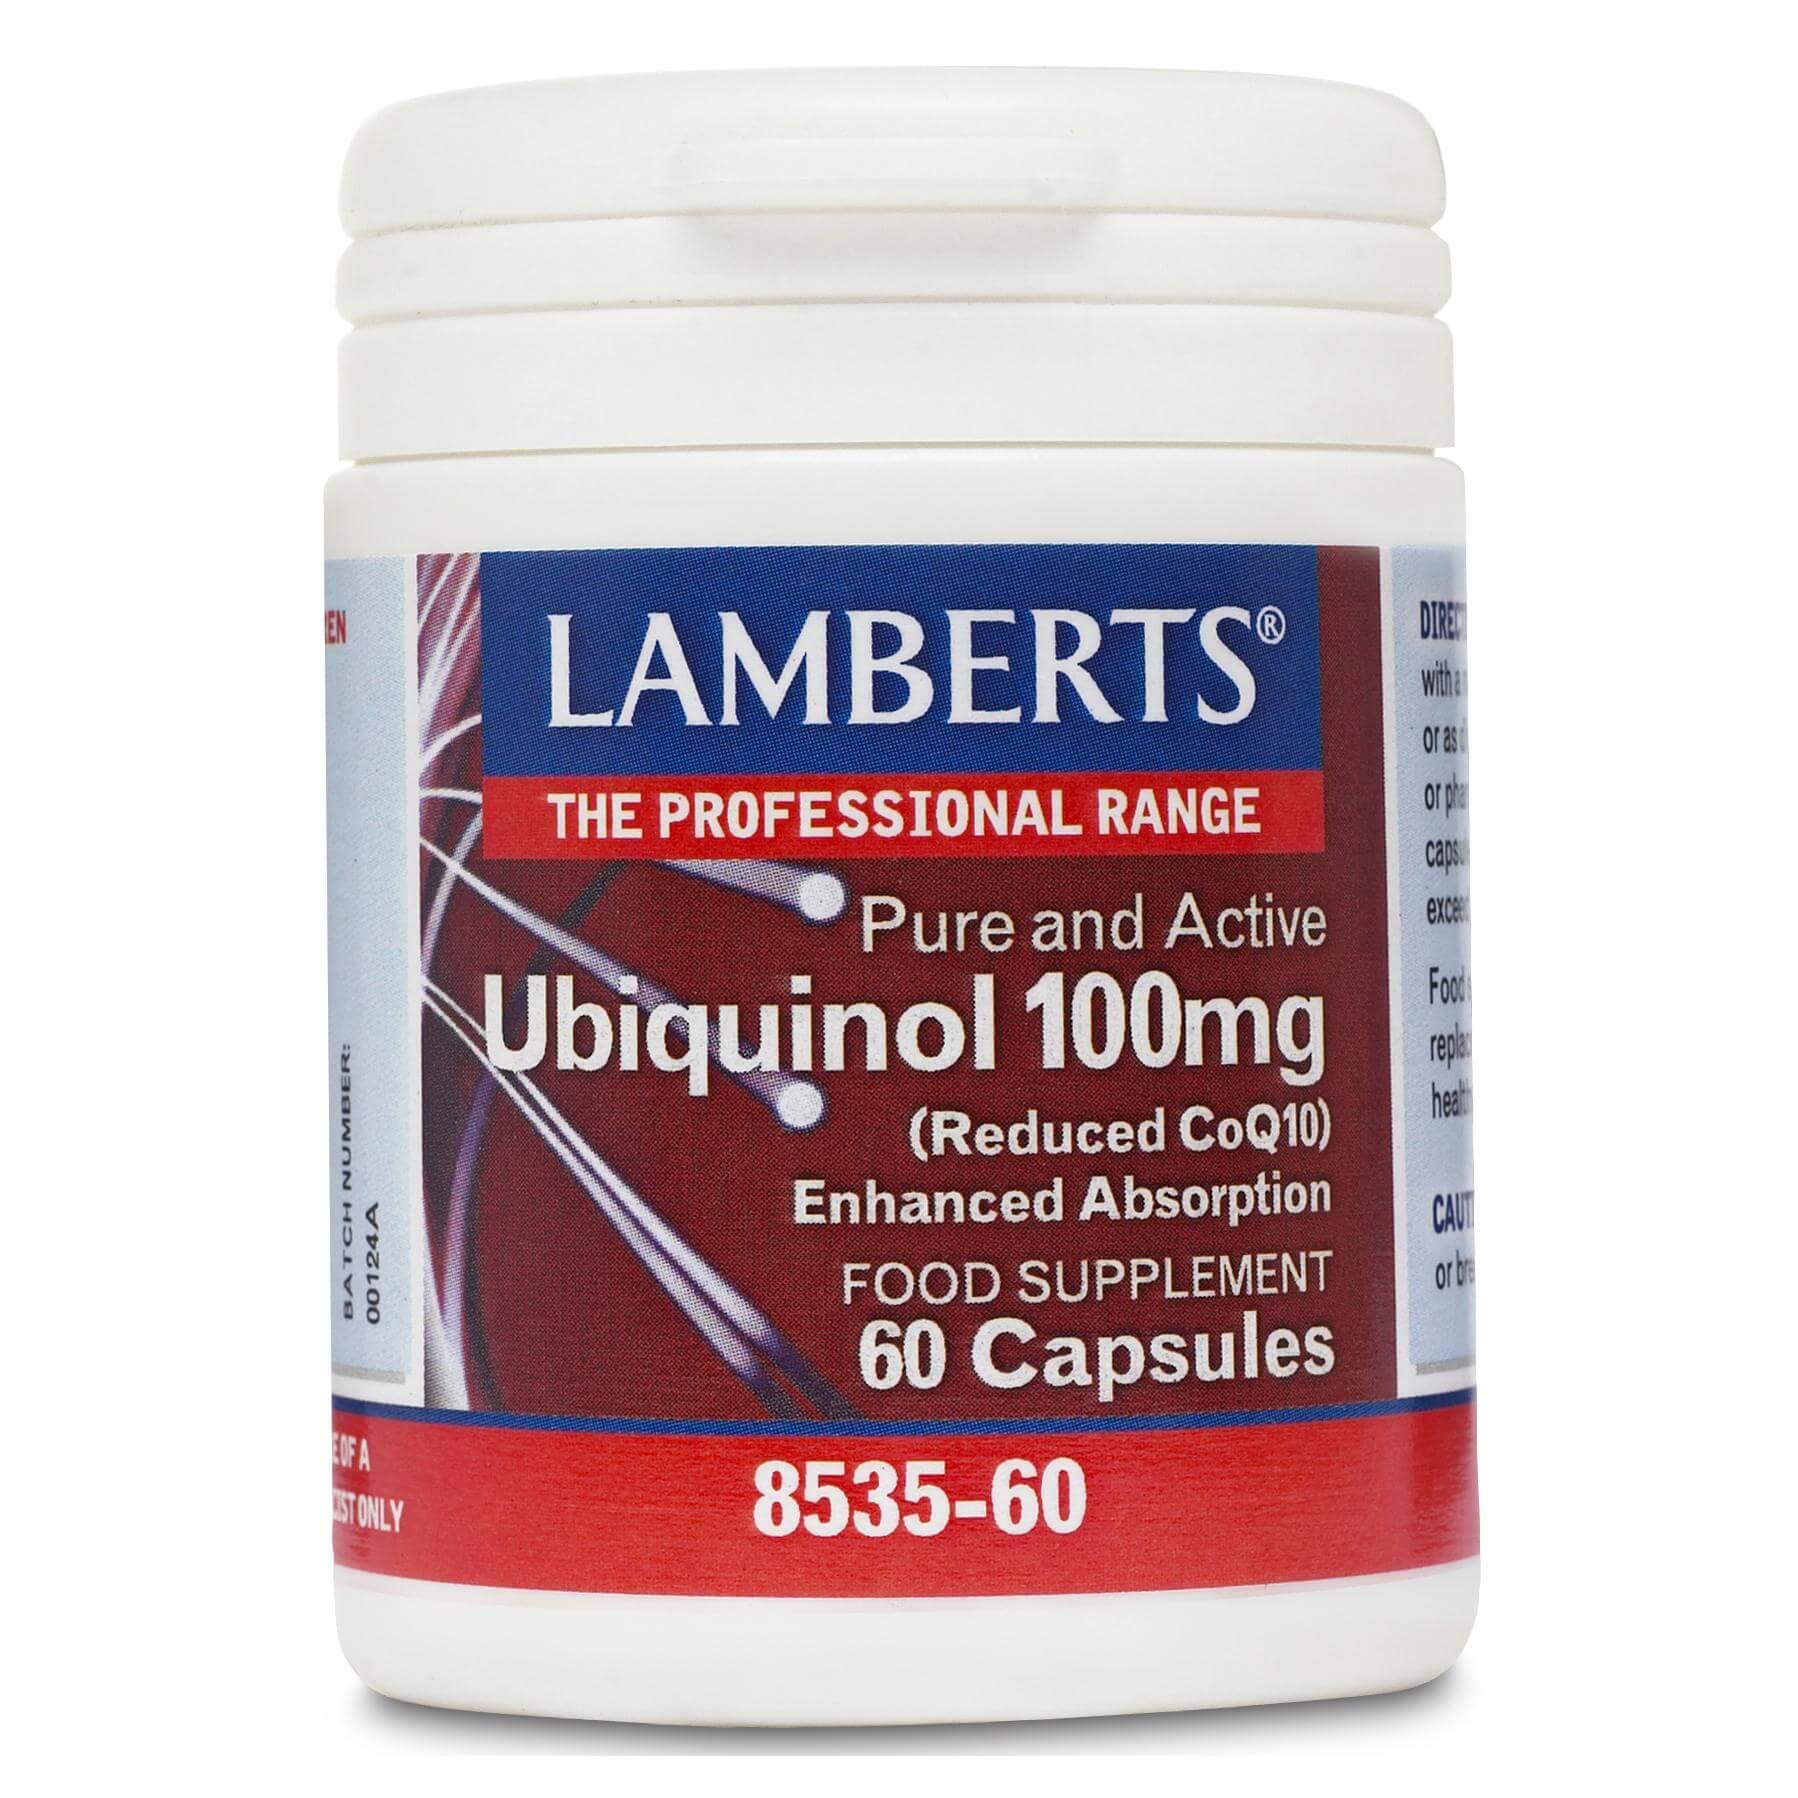 Lamberts Ubiquinol Συμπλήρωμα Διατροφής με Αντιοξειδωτική Δράση 100mg 60 Κάψουλες